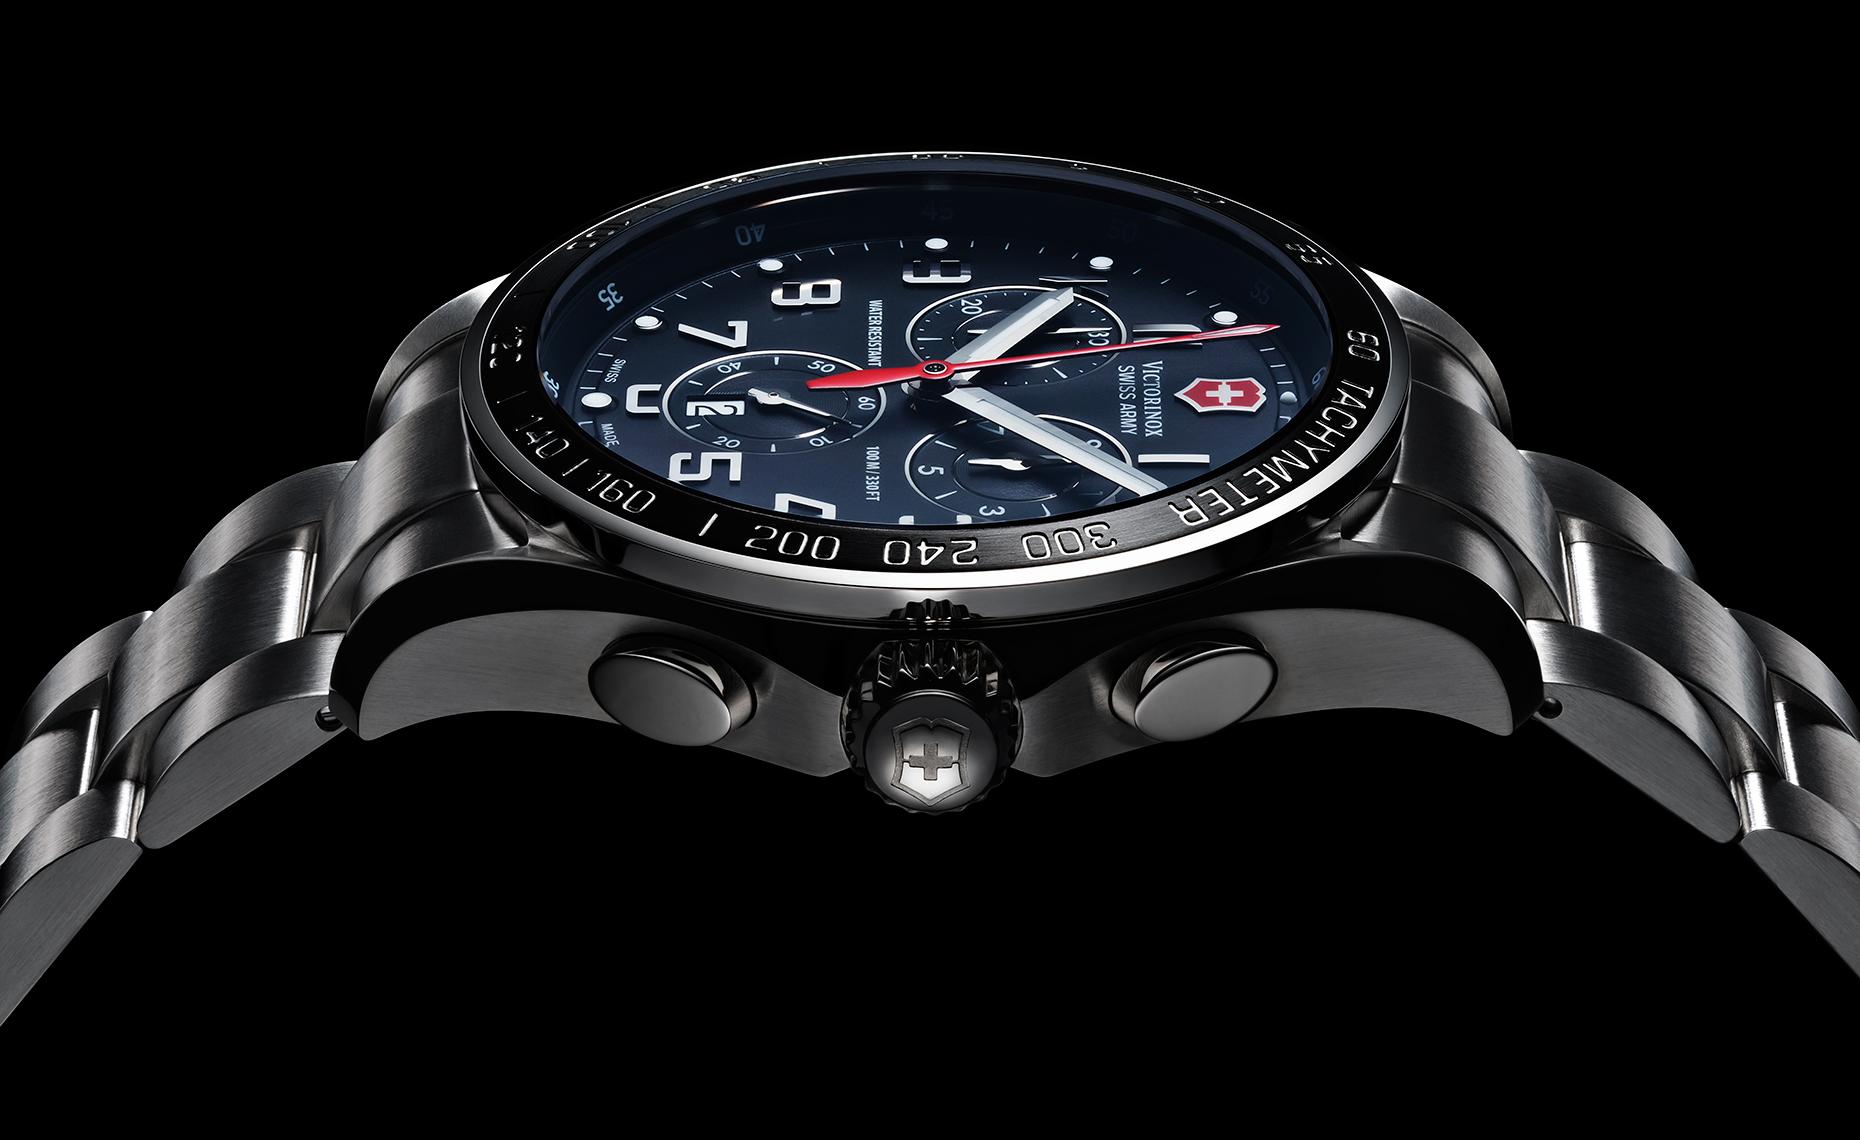 tom-medvedich-still-life-jewelry-watches-victorinox-chrono-01.jpg